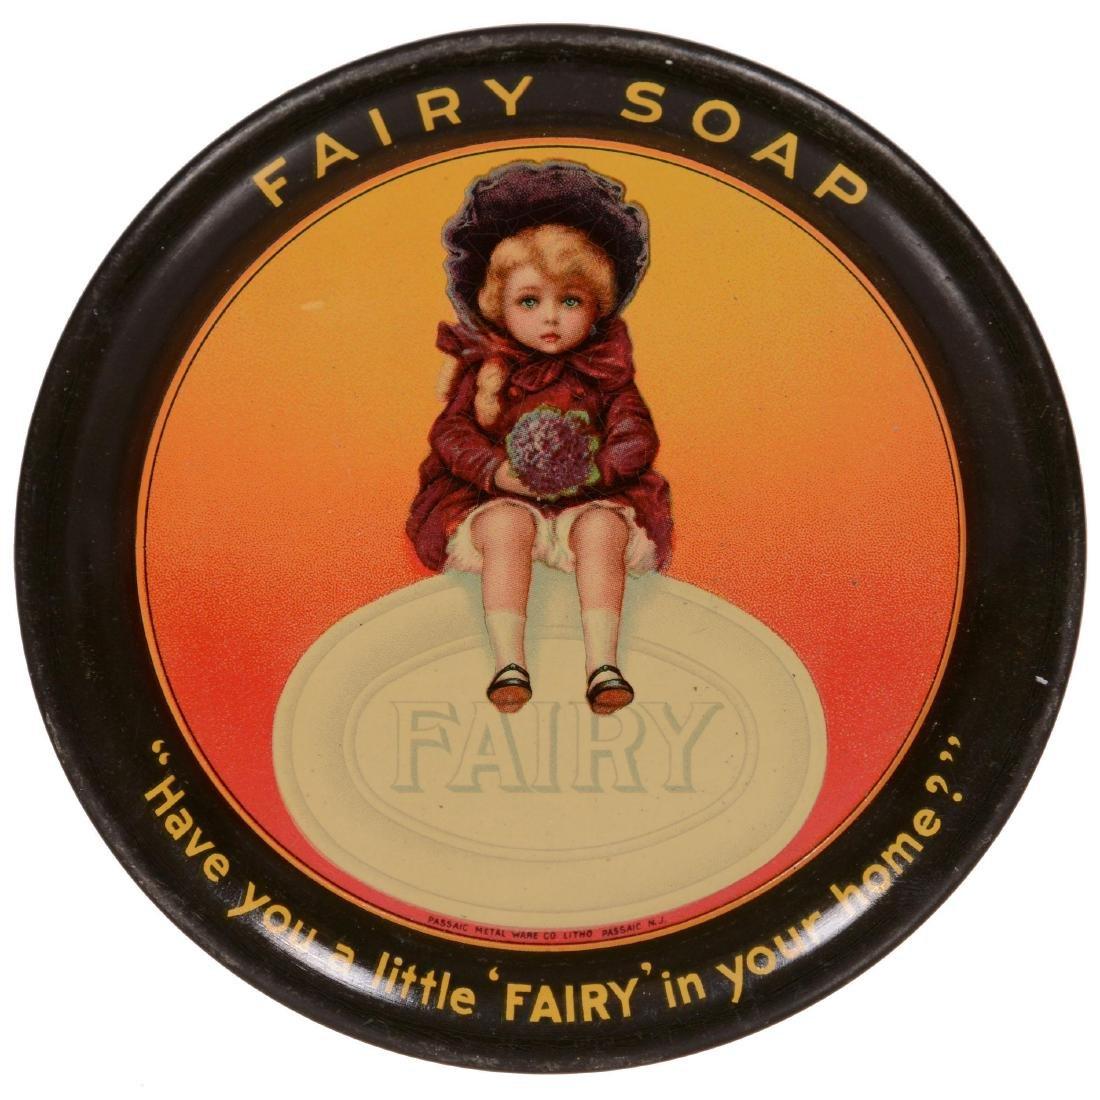 Original Round Advertising Tip Tray